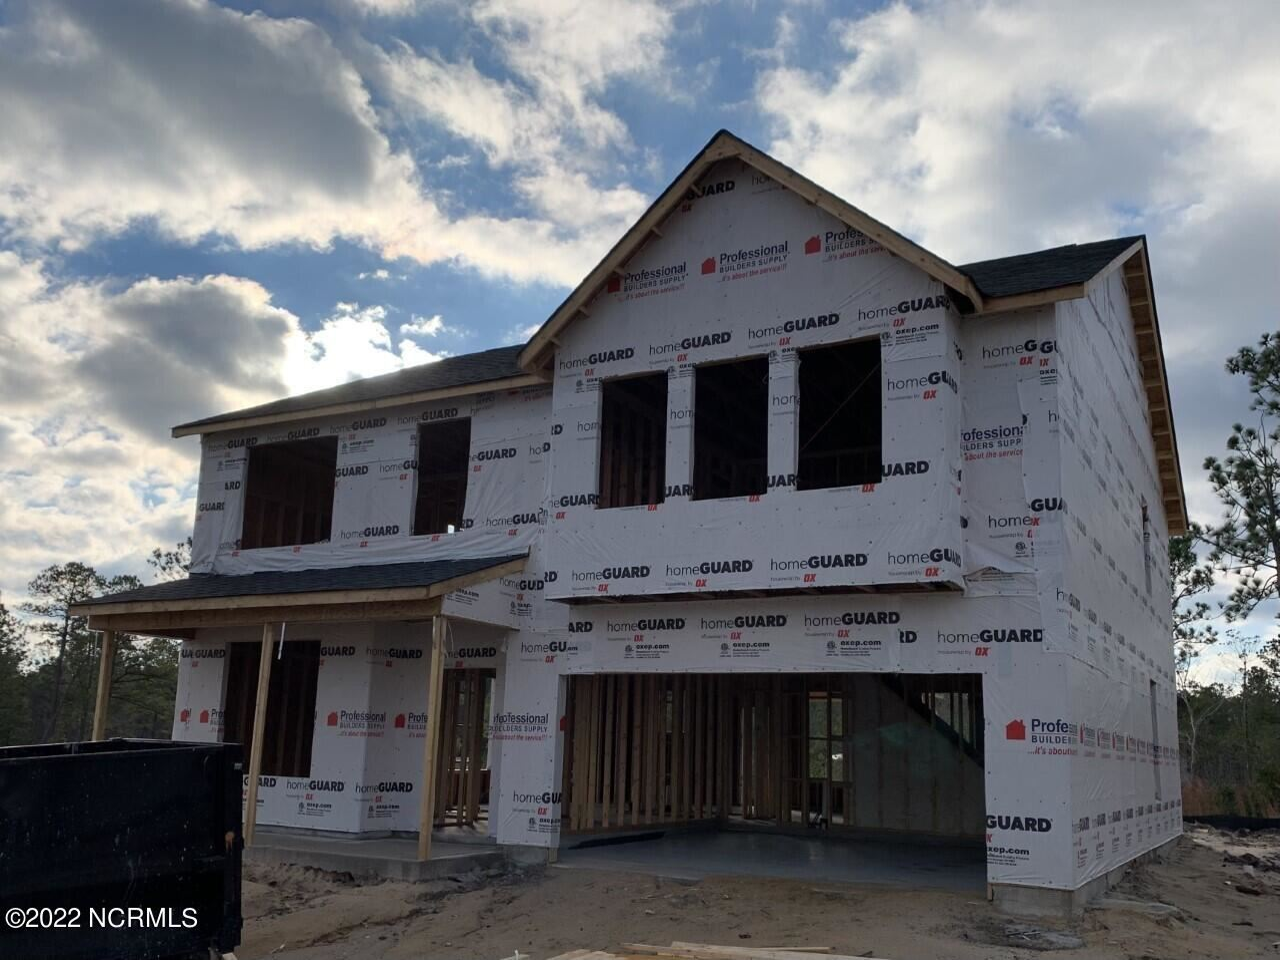 Photo of 2598 Longleaf Pine Circle, Leland, NC 28451 (MLS # 100282954)